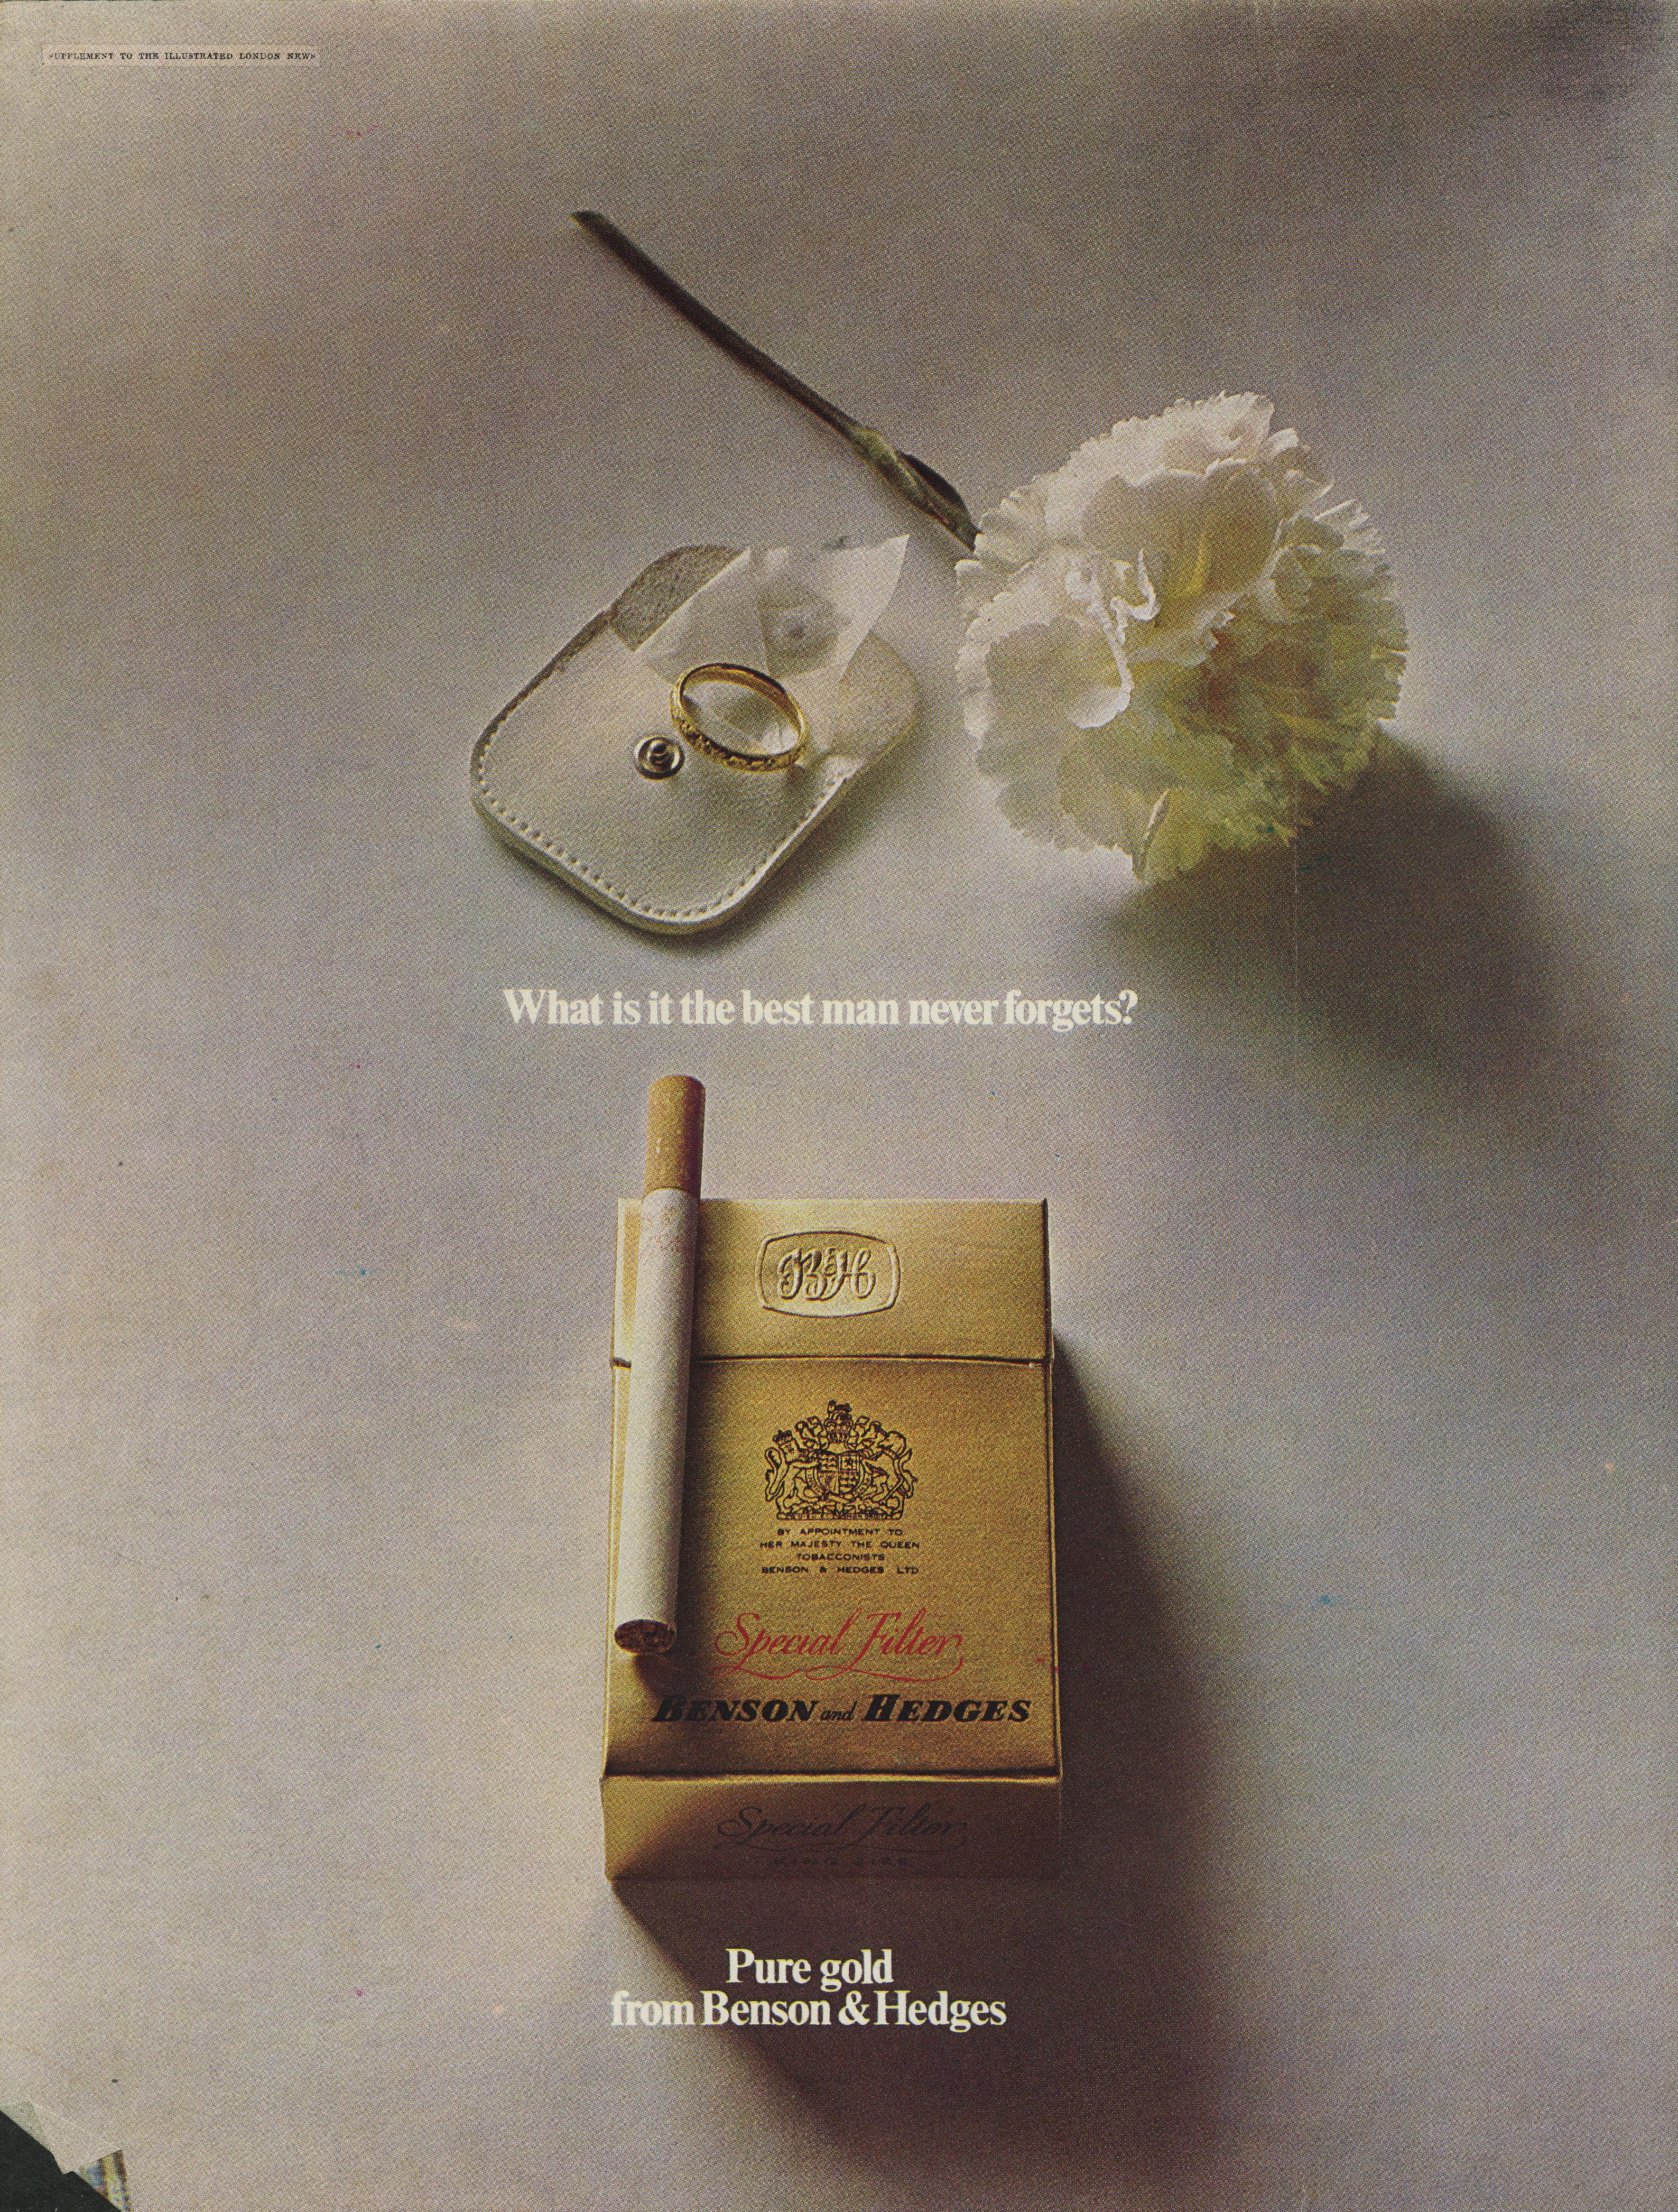 B&H Gold Box 'Best Man' CDP-01